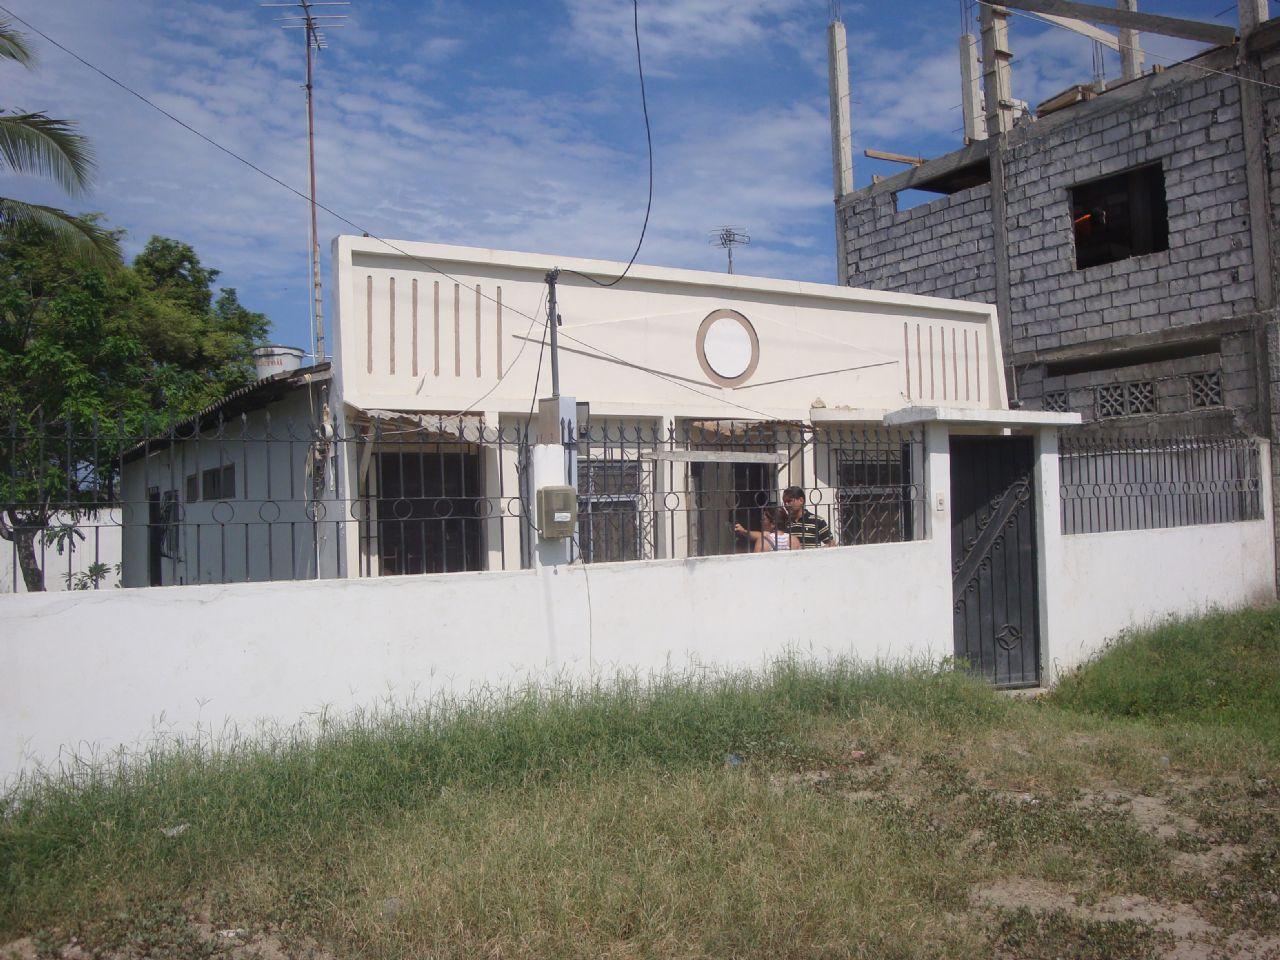 santa elena singles For sale - 3 santa elena, rancho santa margarita, ca - $989,000 view details, map and photos of this single family property with 4.